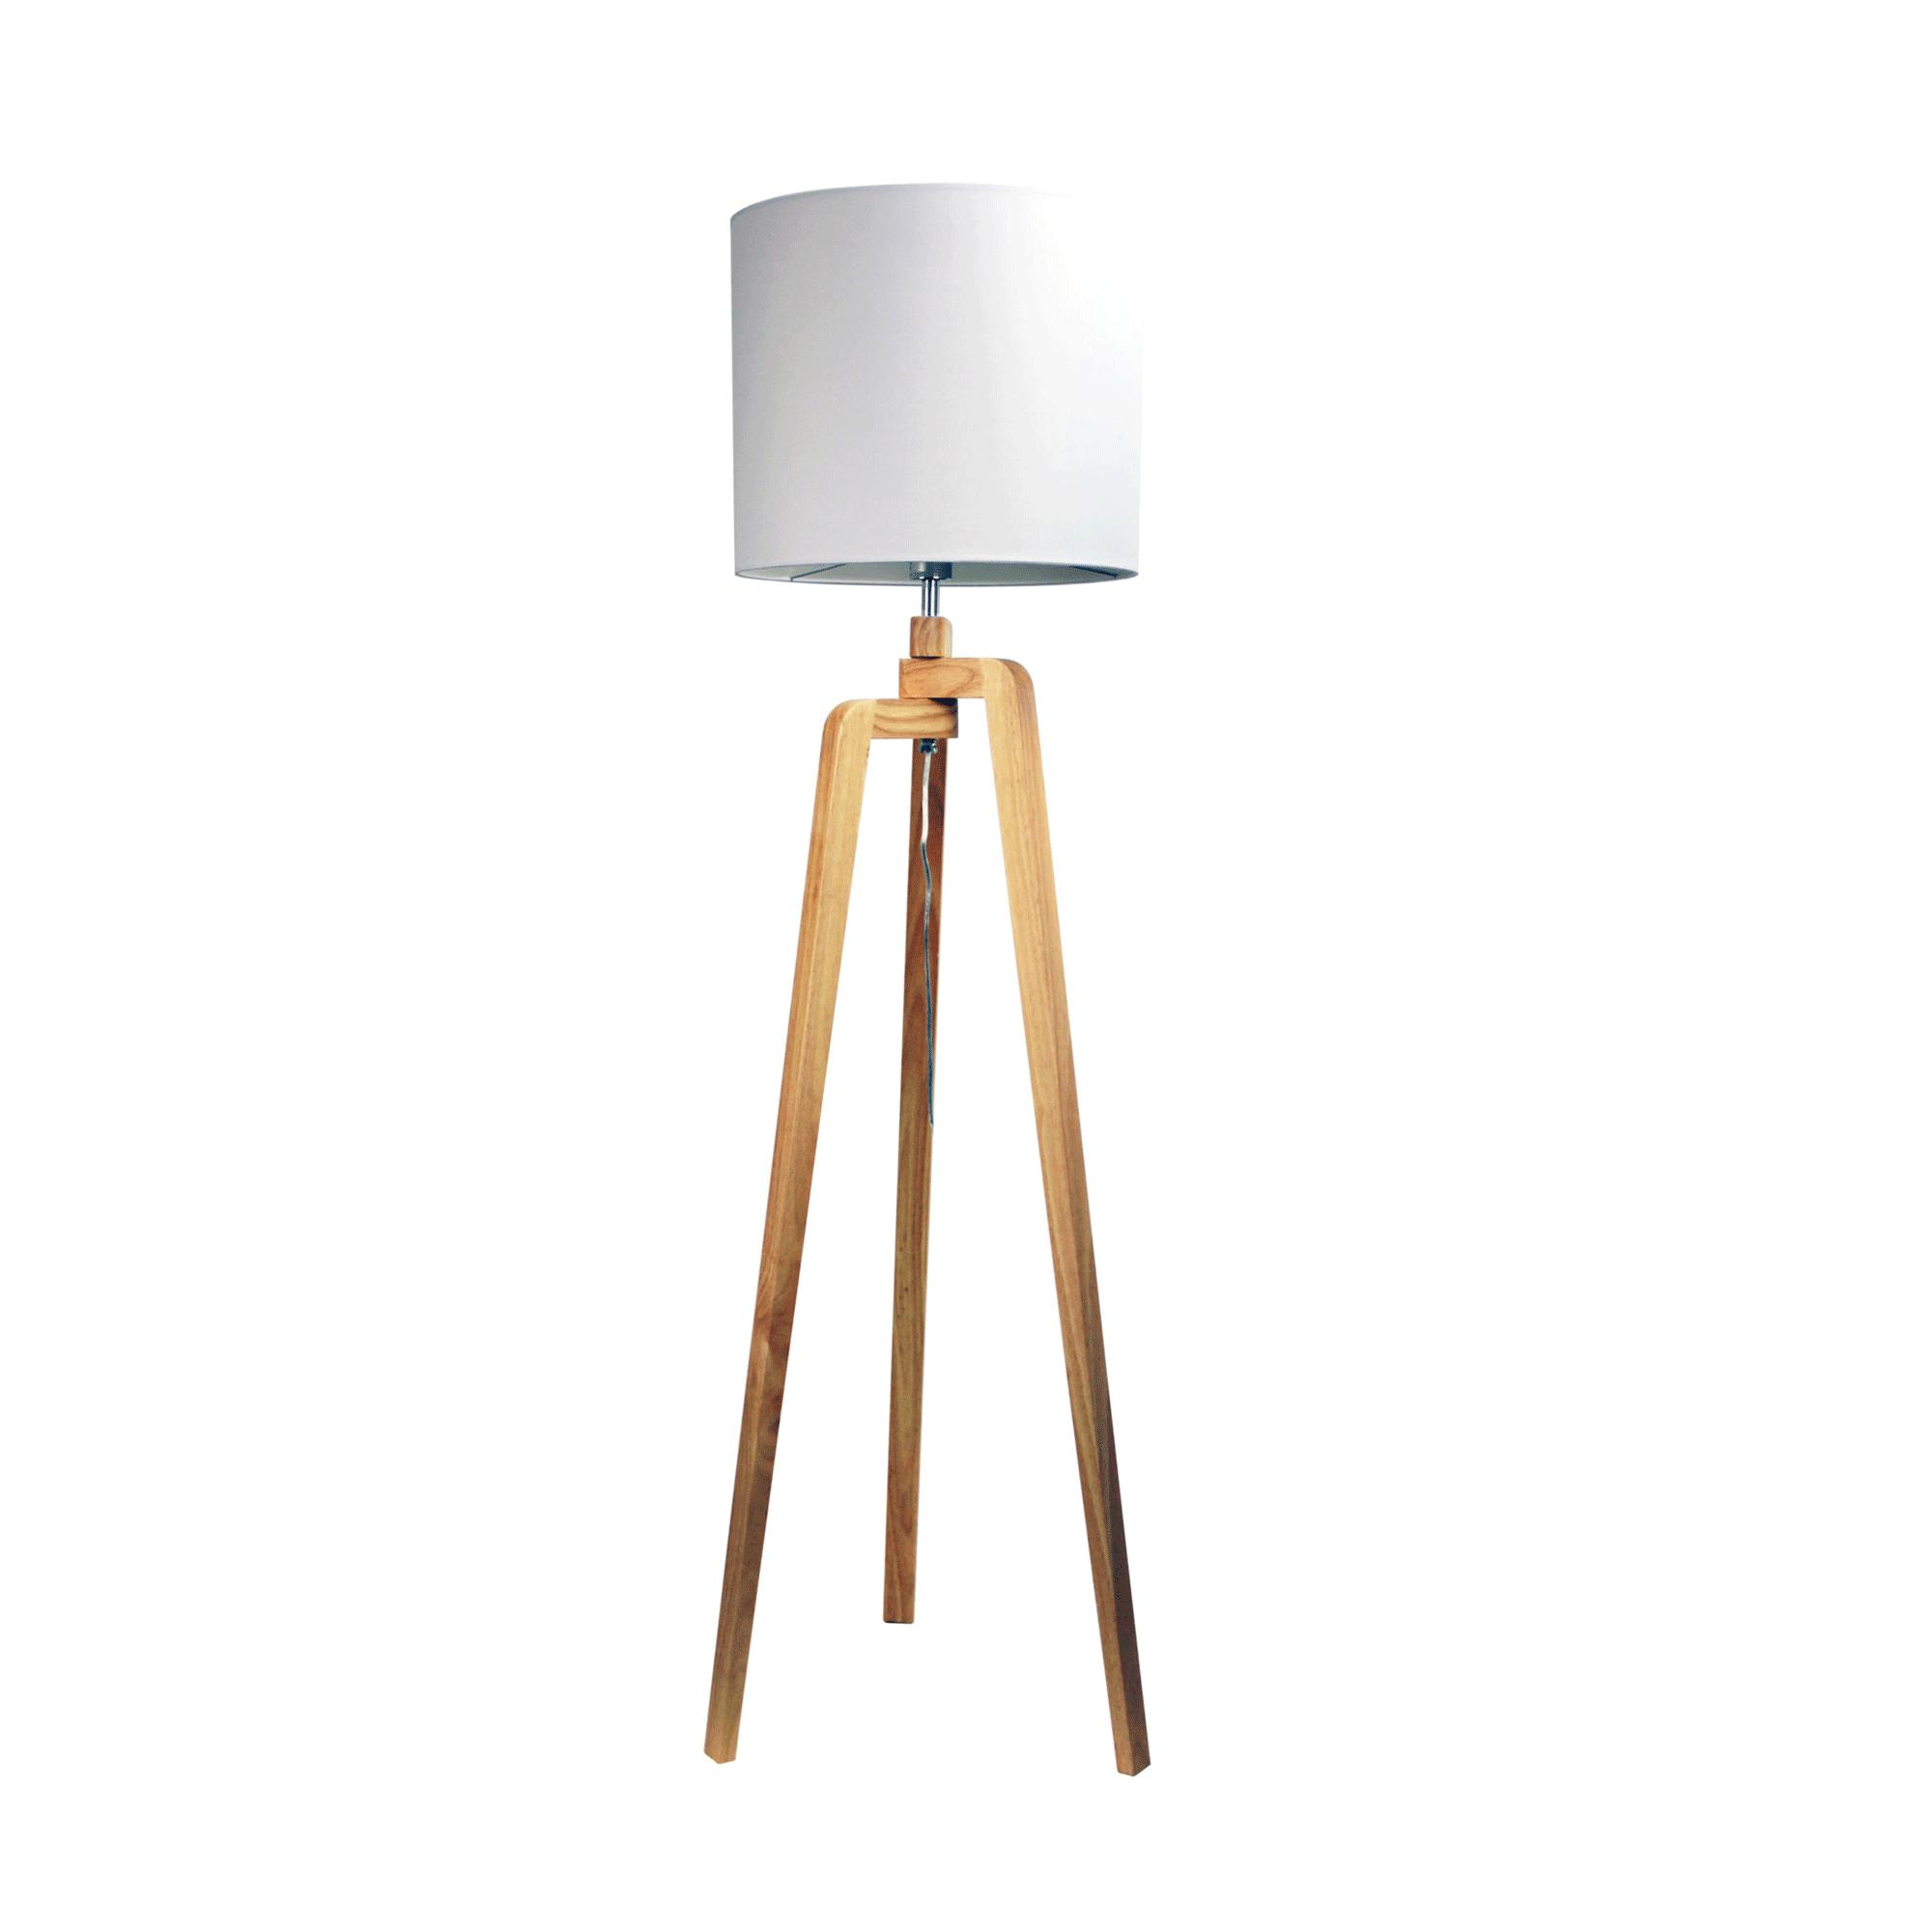 Lund Scandinavian Style Floor Lamp Matt Blatt